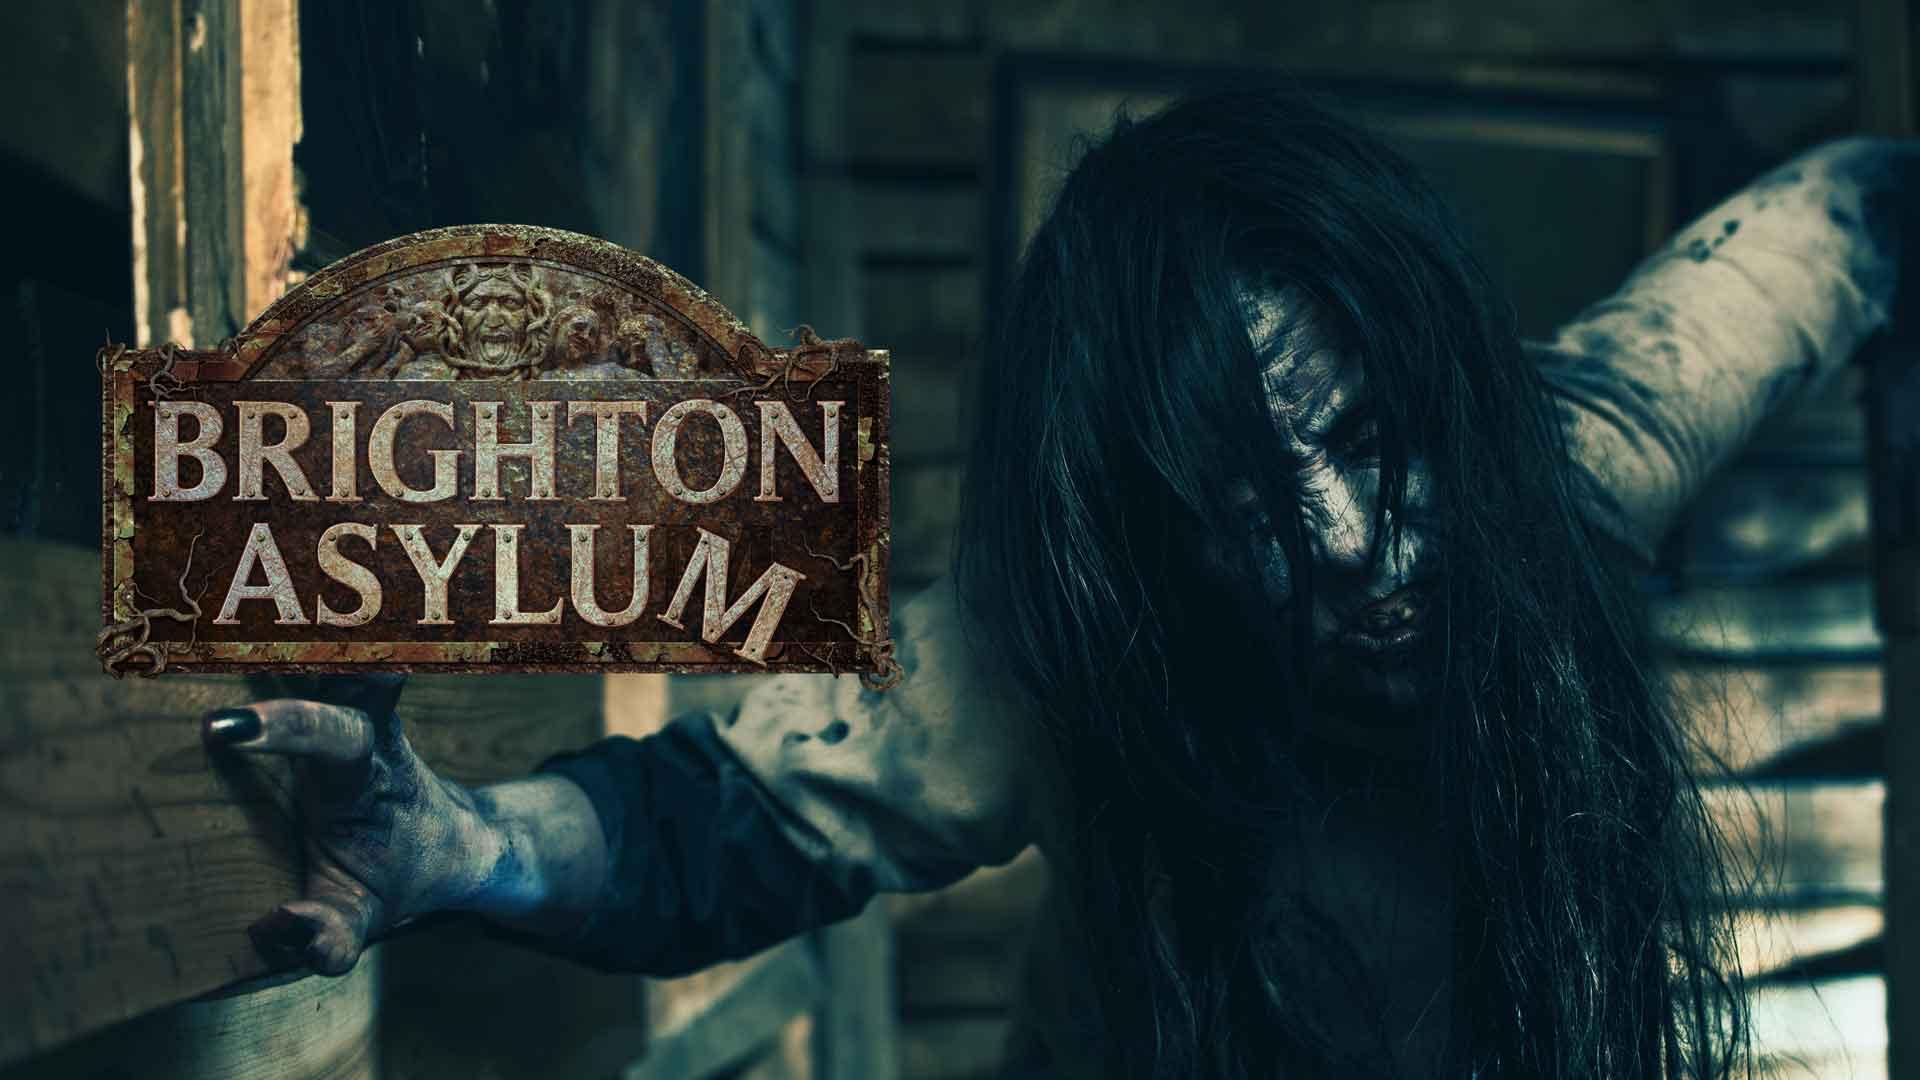 Haunted Attractions in NJ & Haunted House NJ - Brighton Asylum